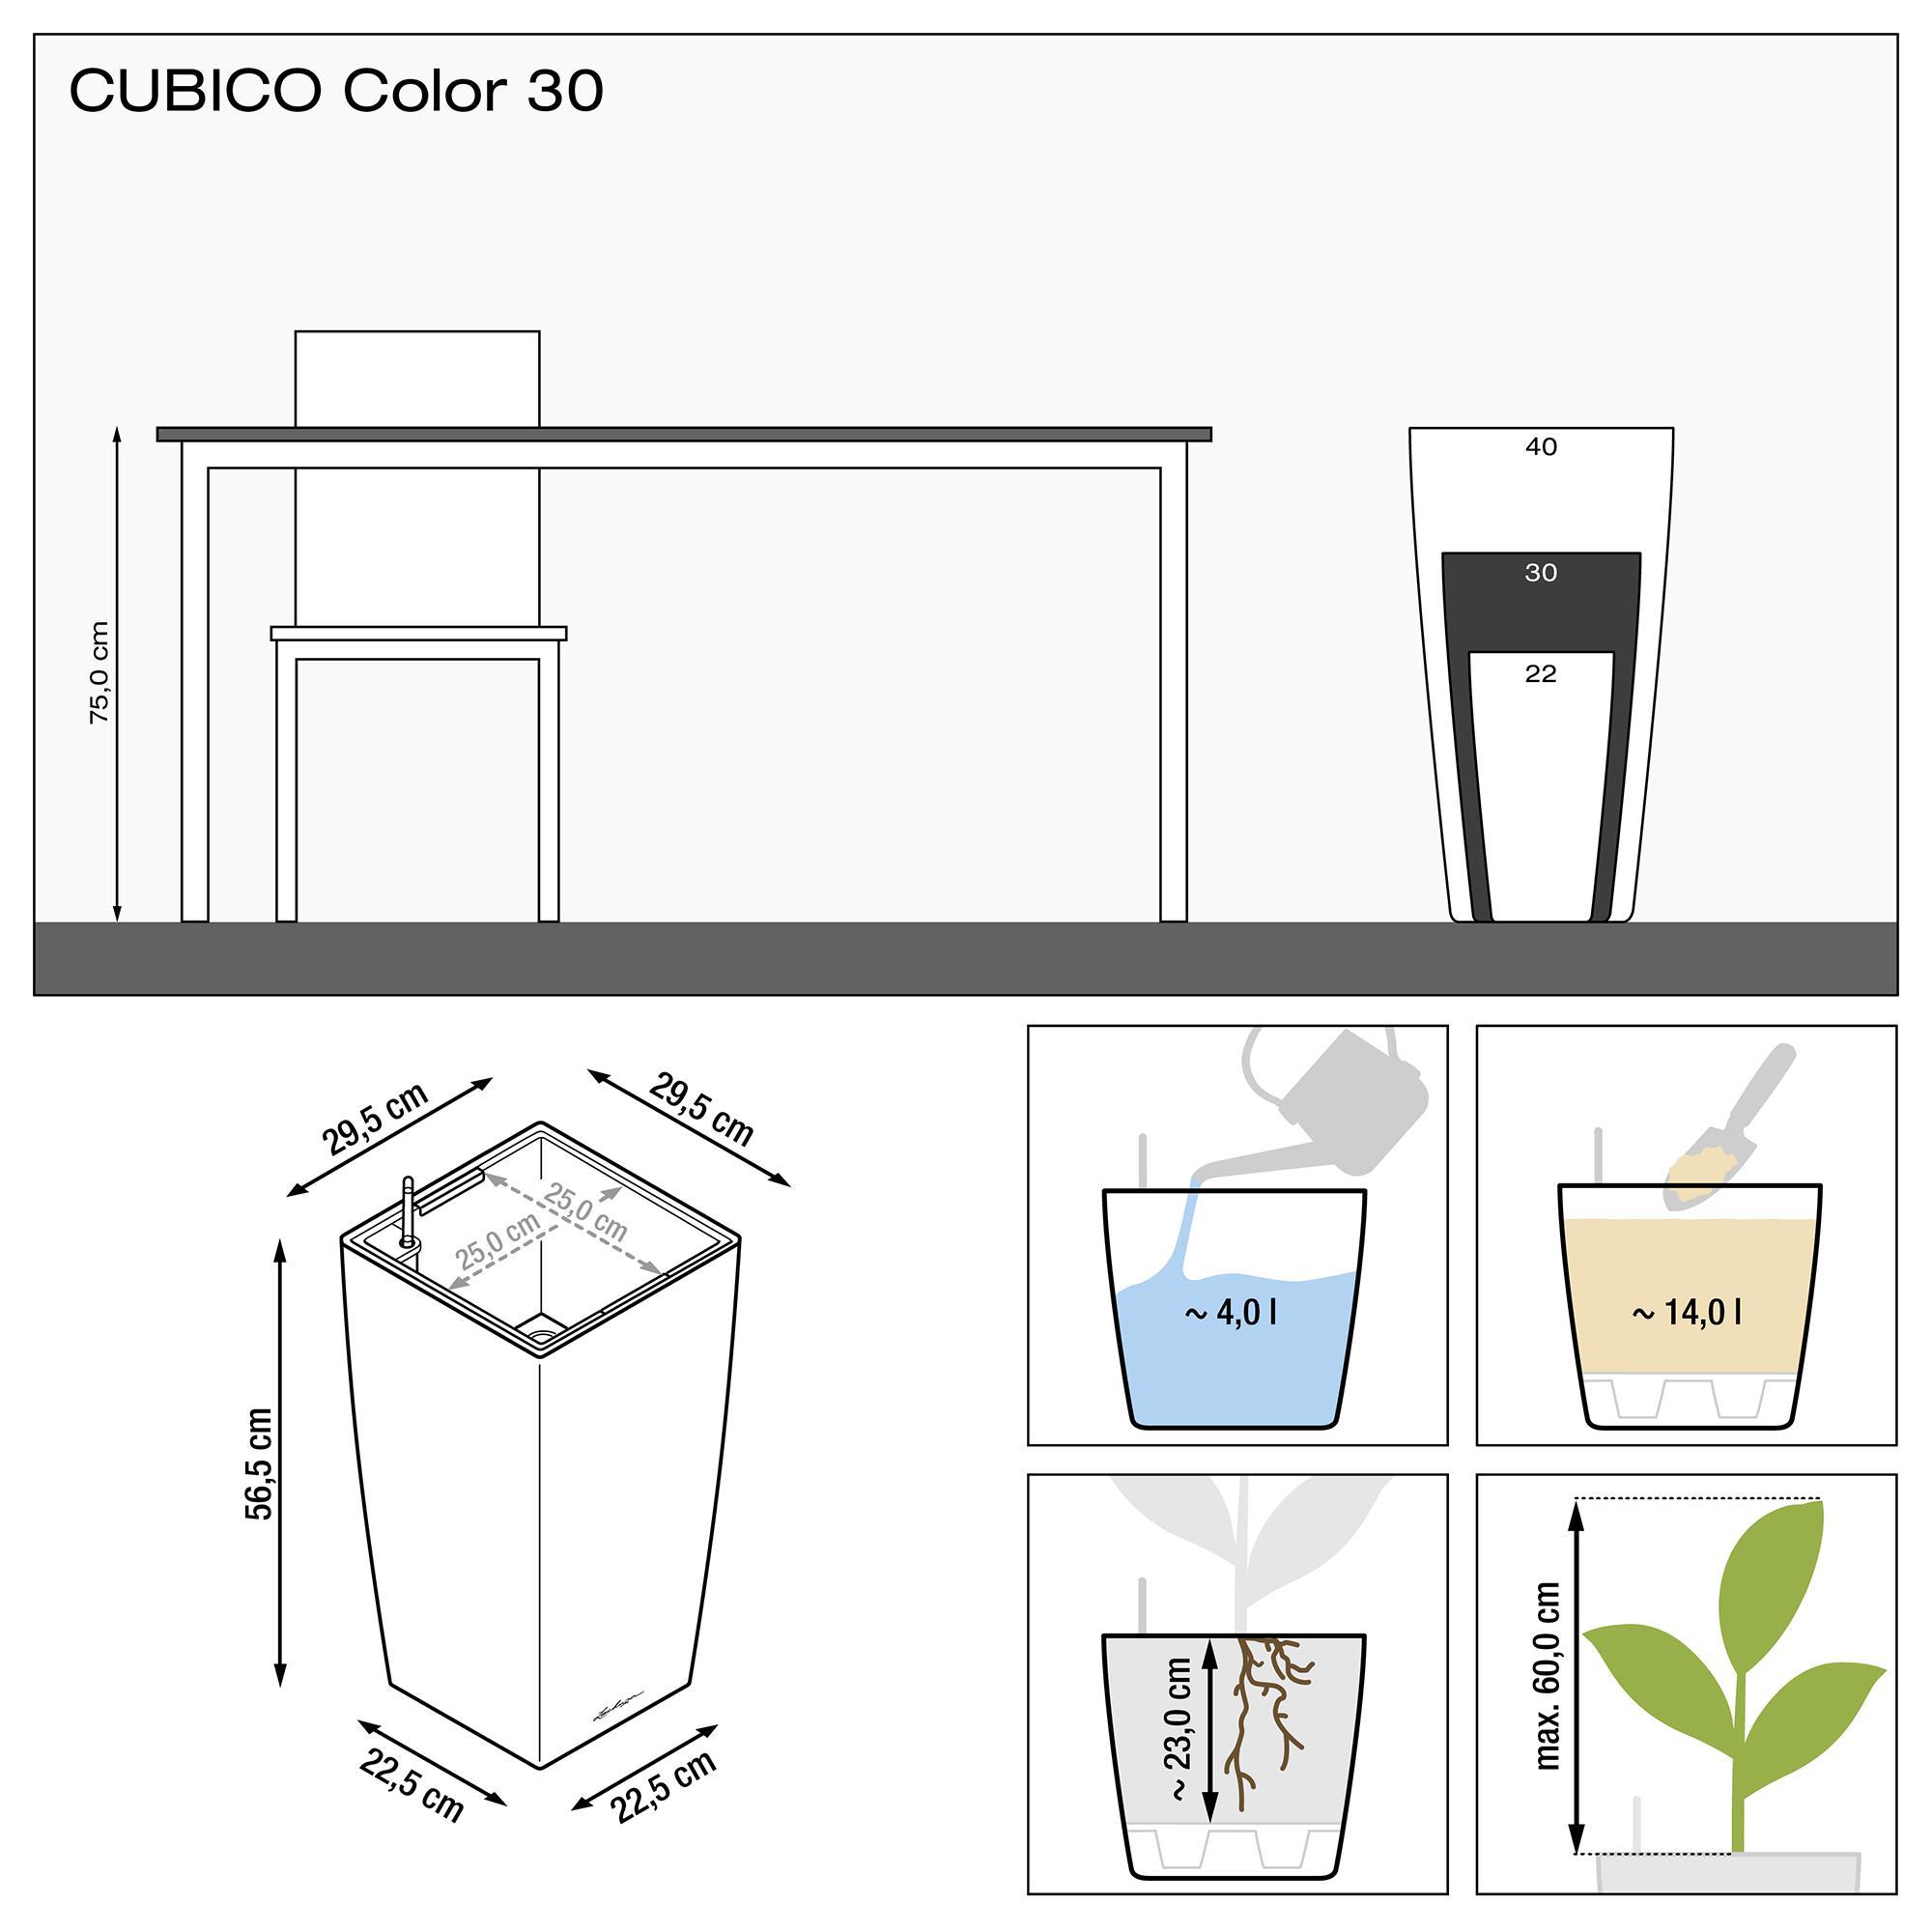 CUBICO Color 30 slate - Image 3